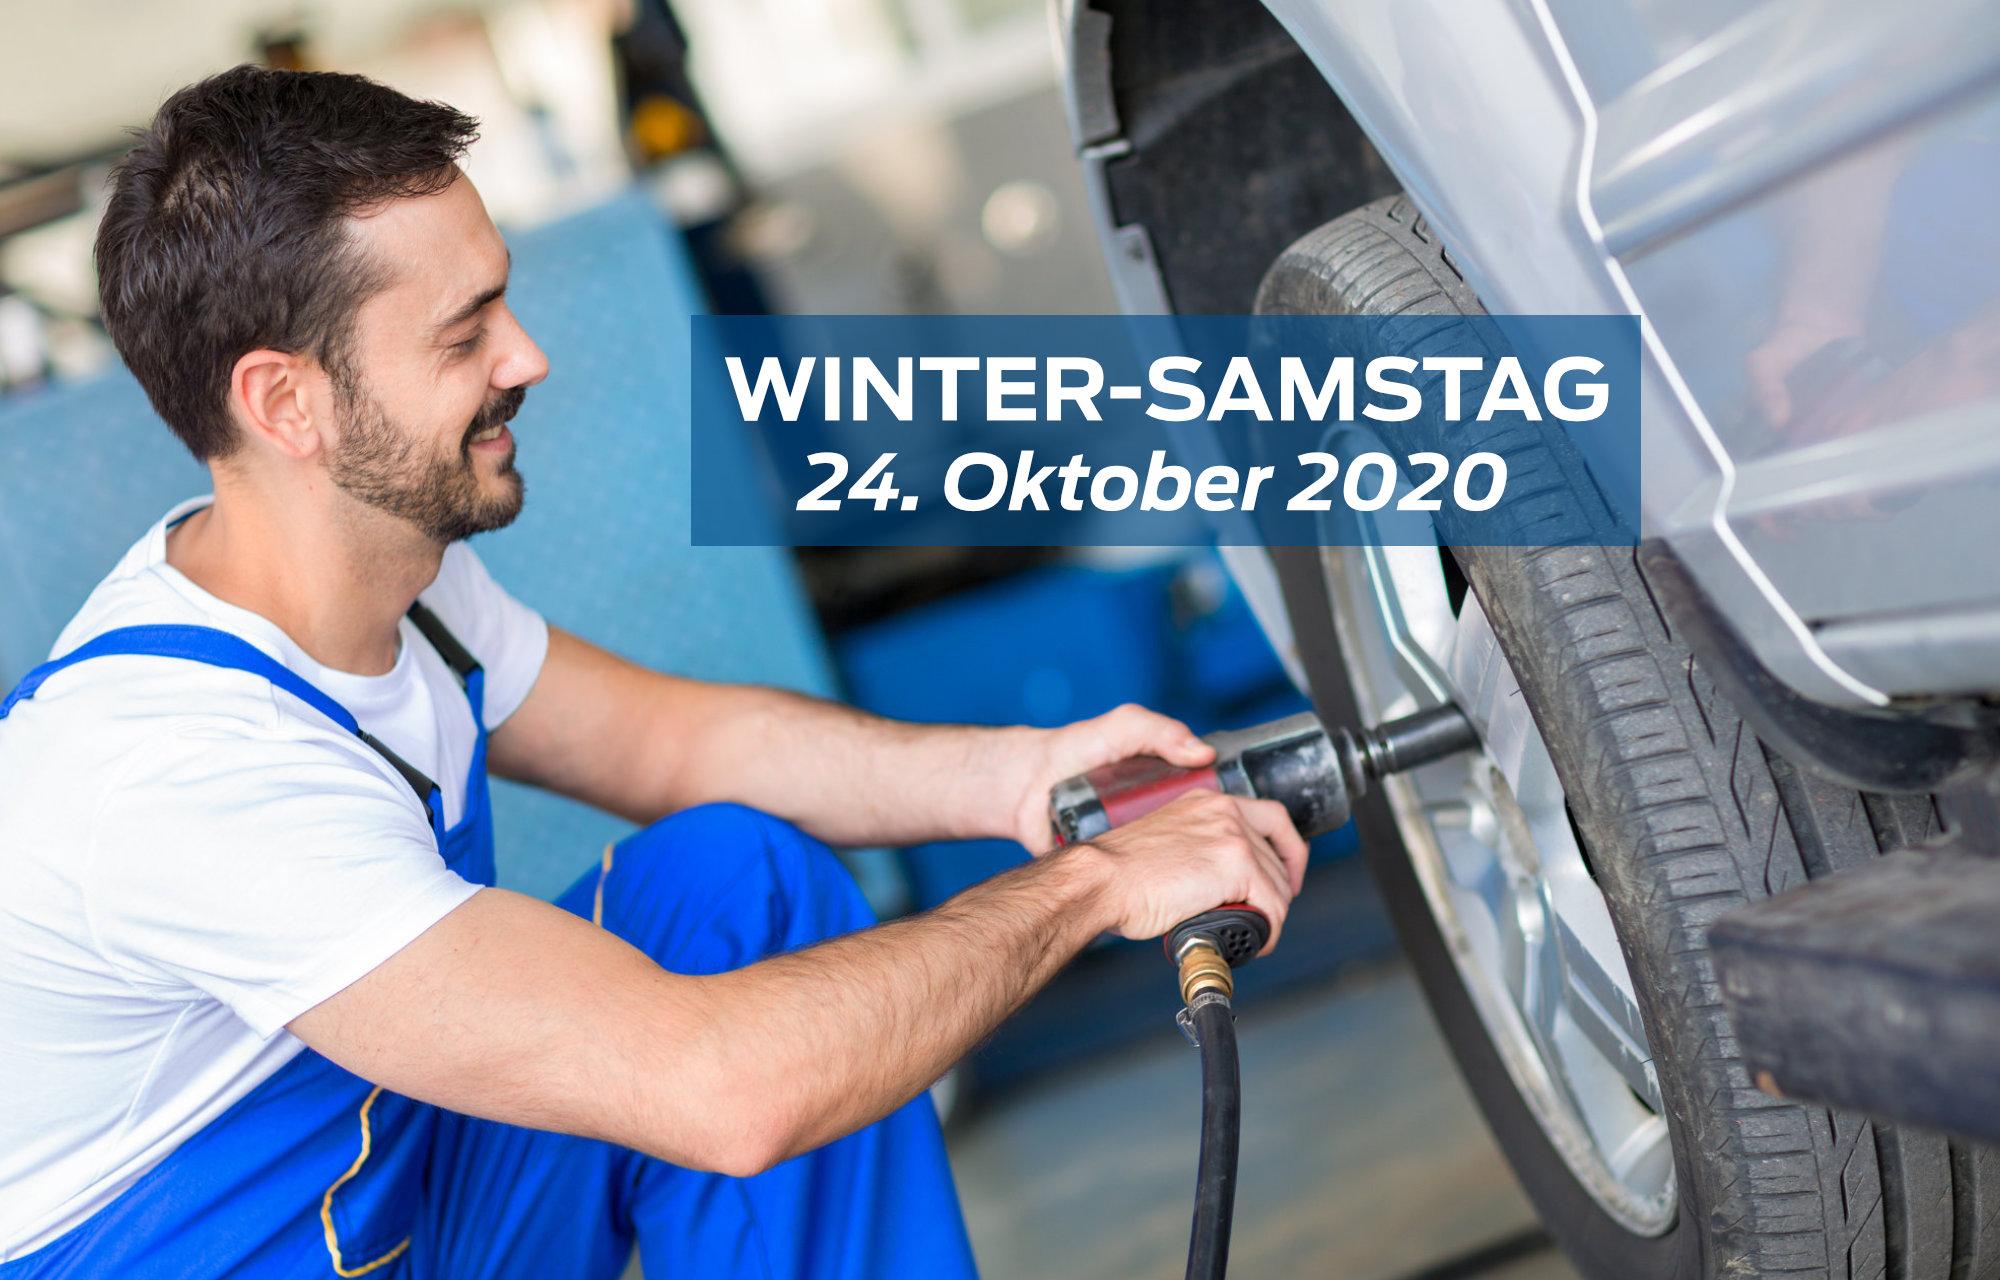 Winter-Samstag 24.10.2020